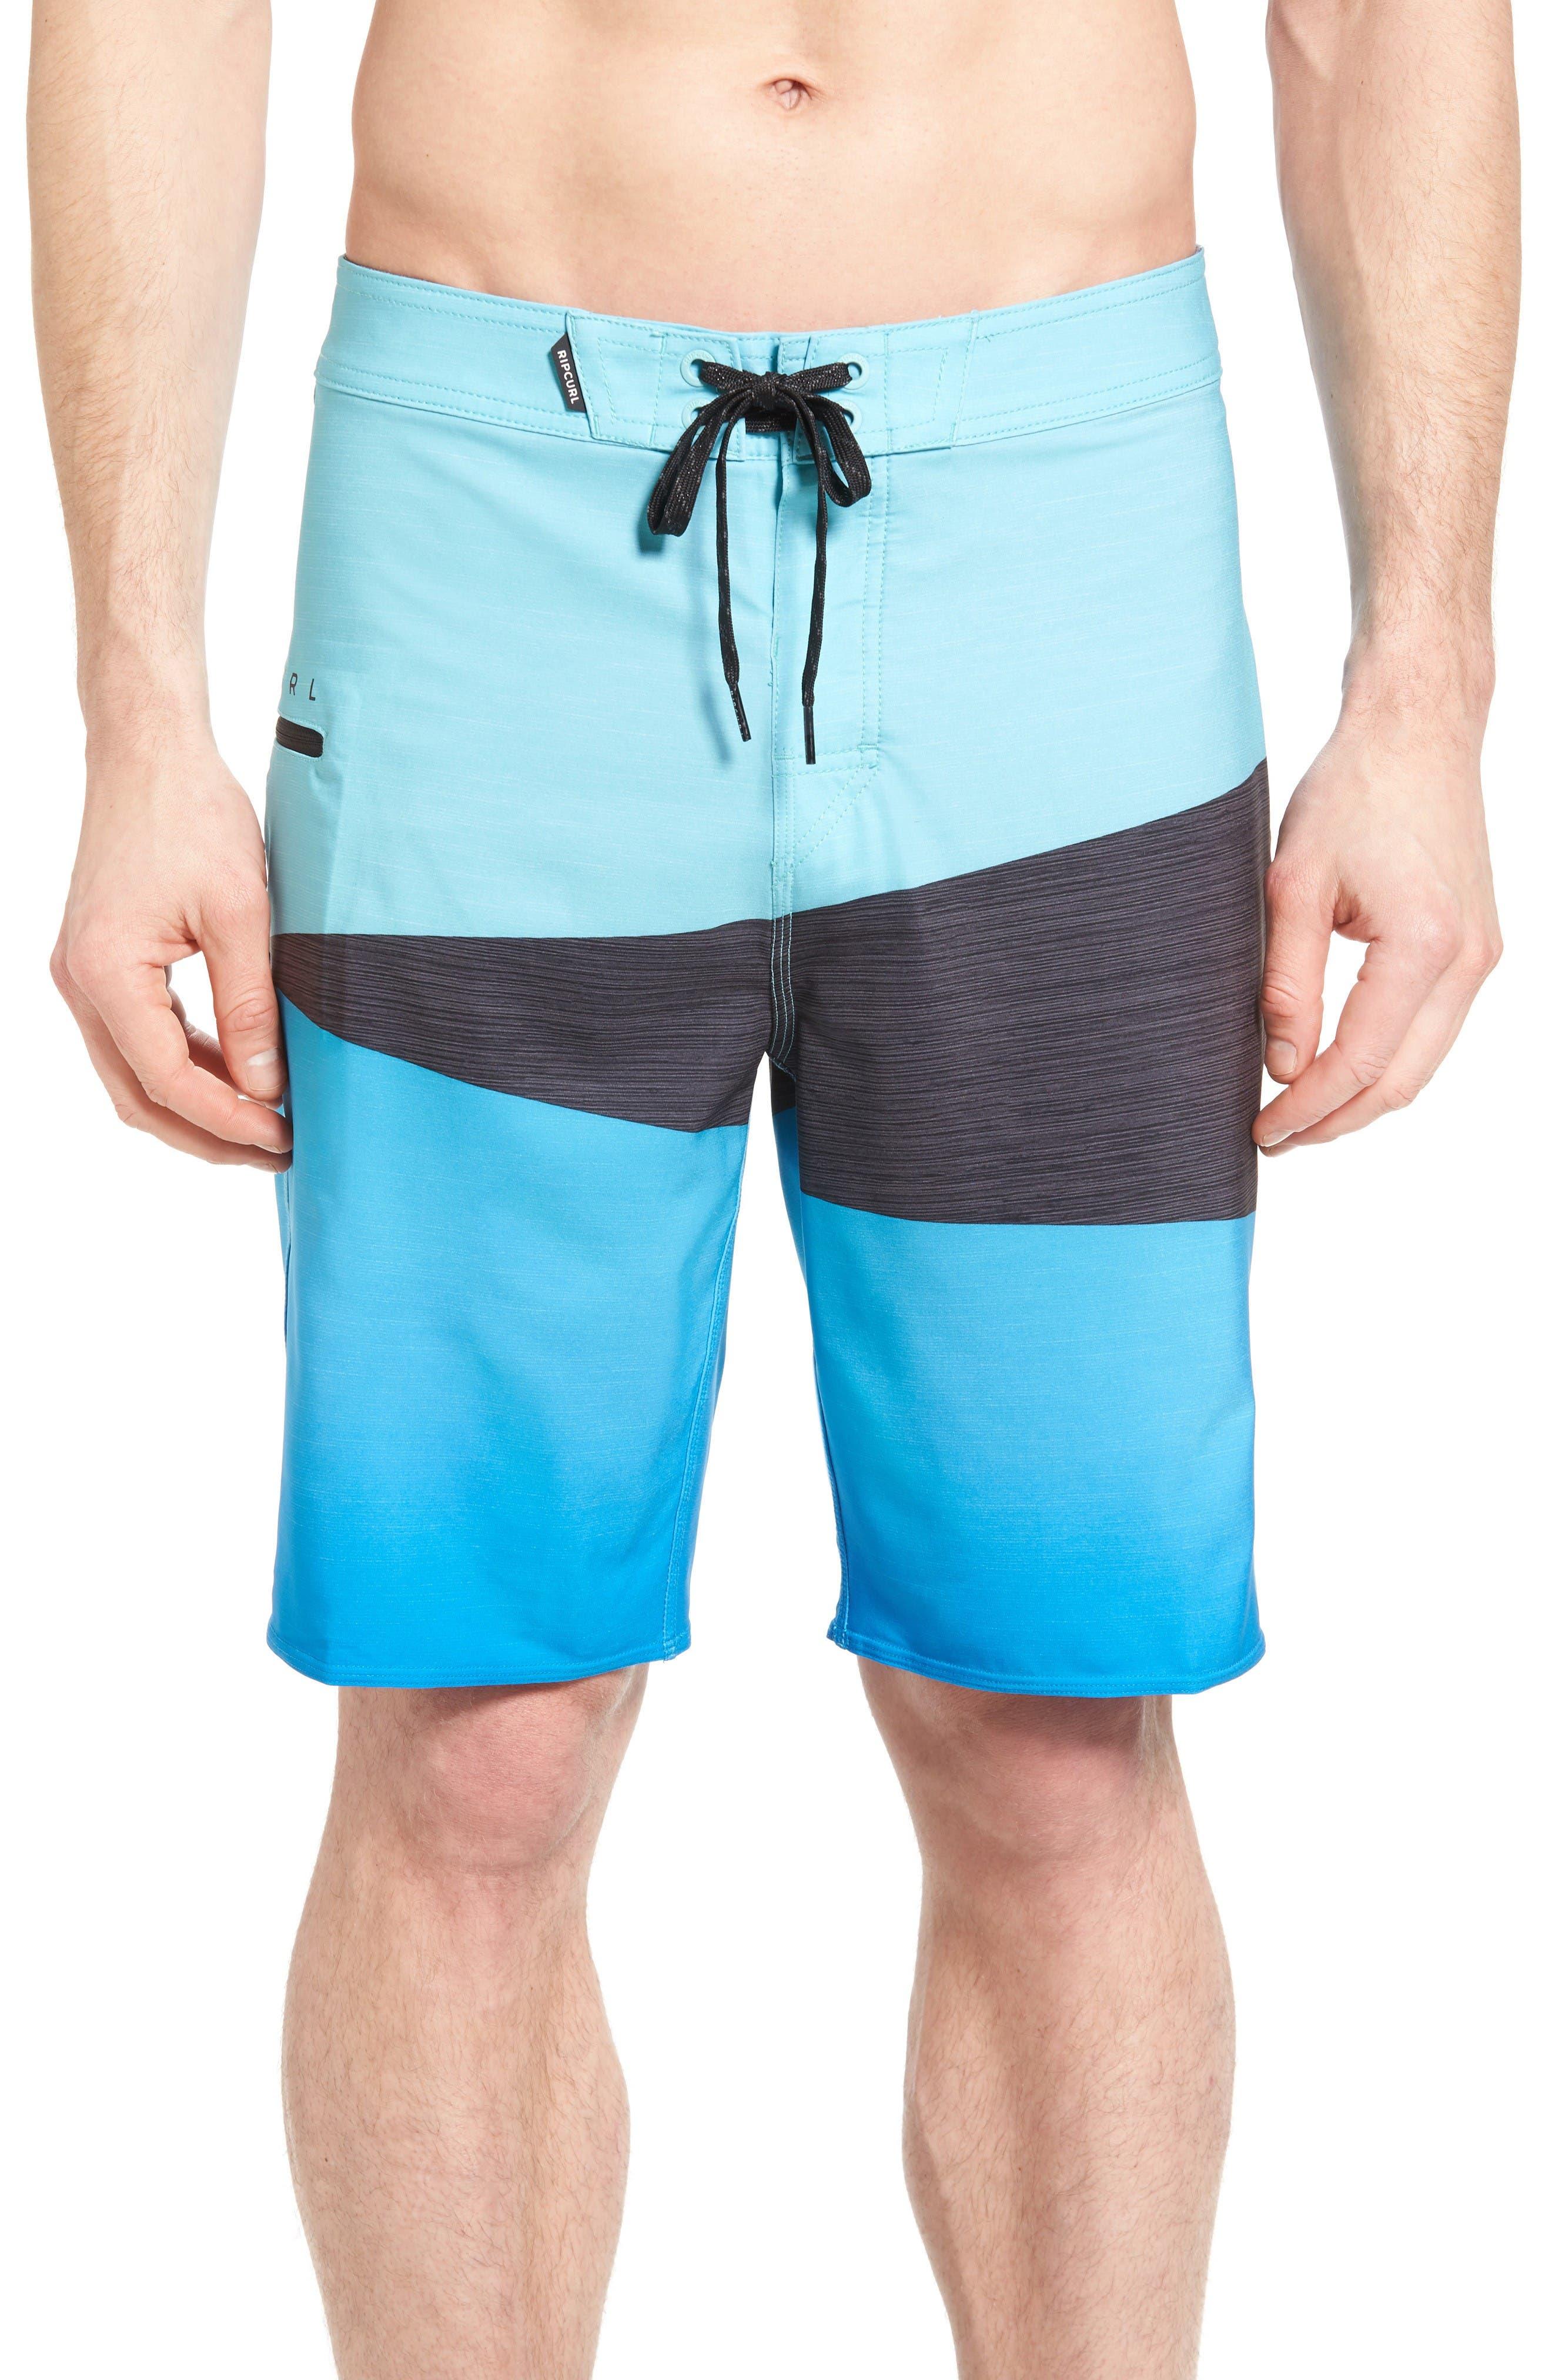 Main Image - Rip Curl Mirage Wedge Board Shorts